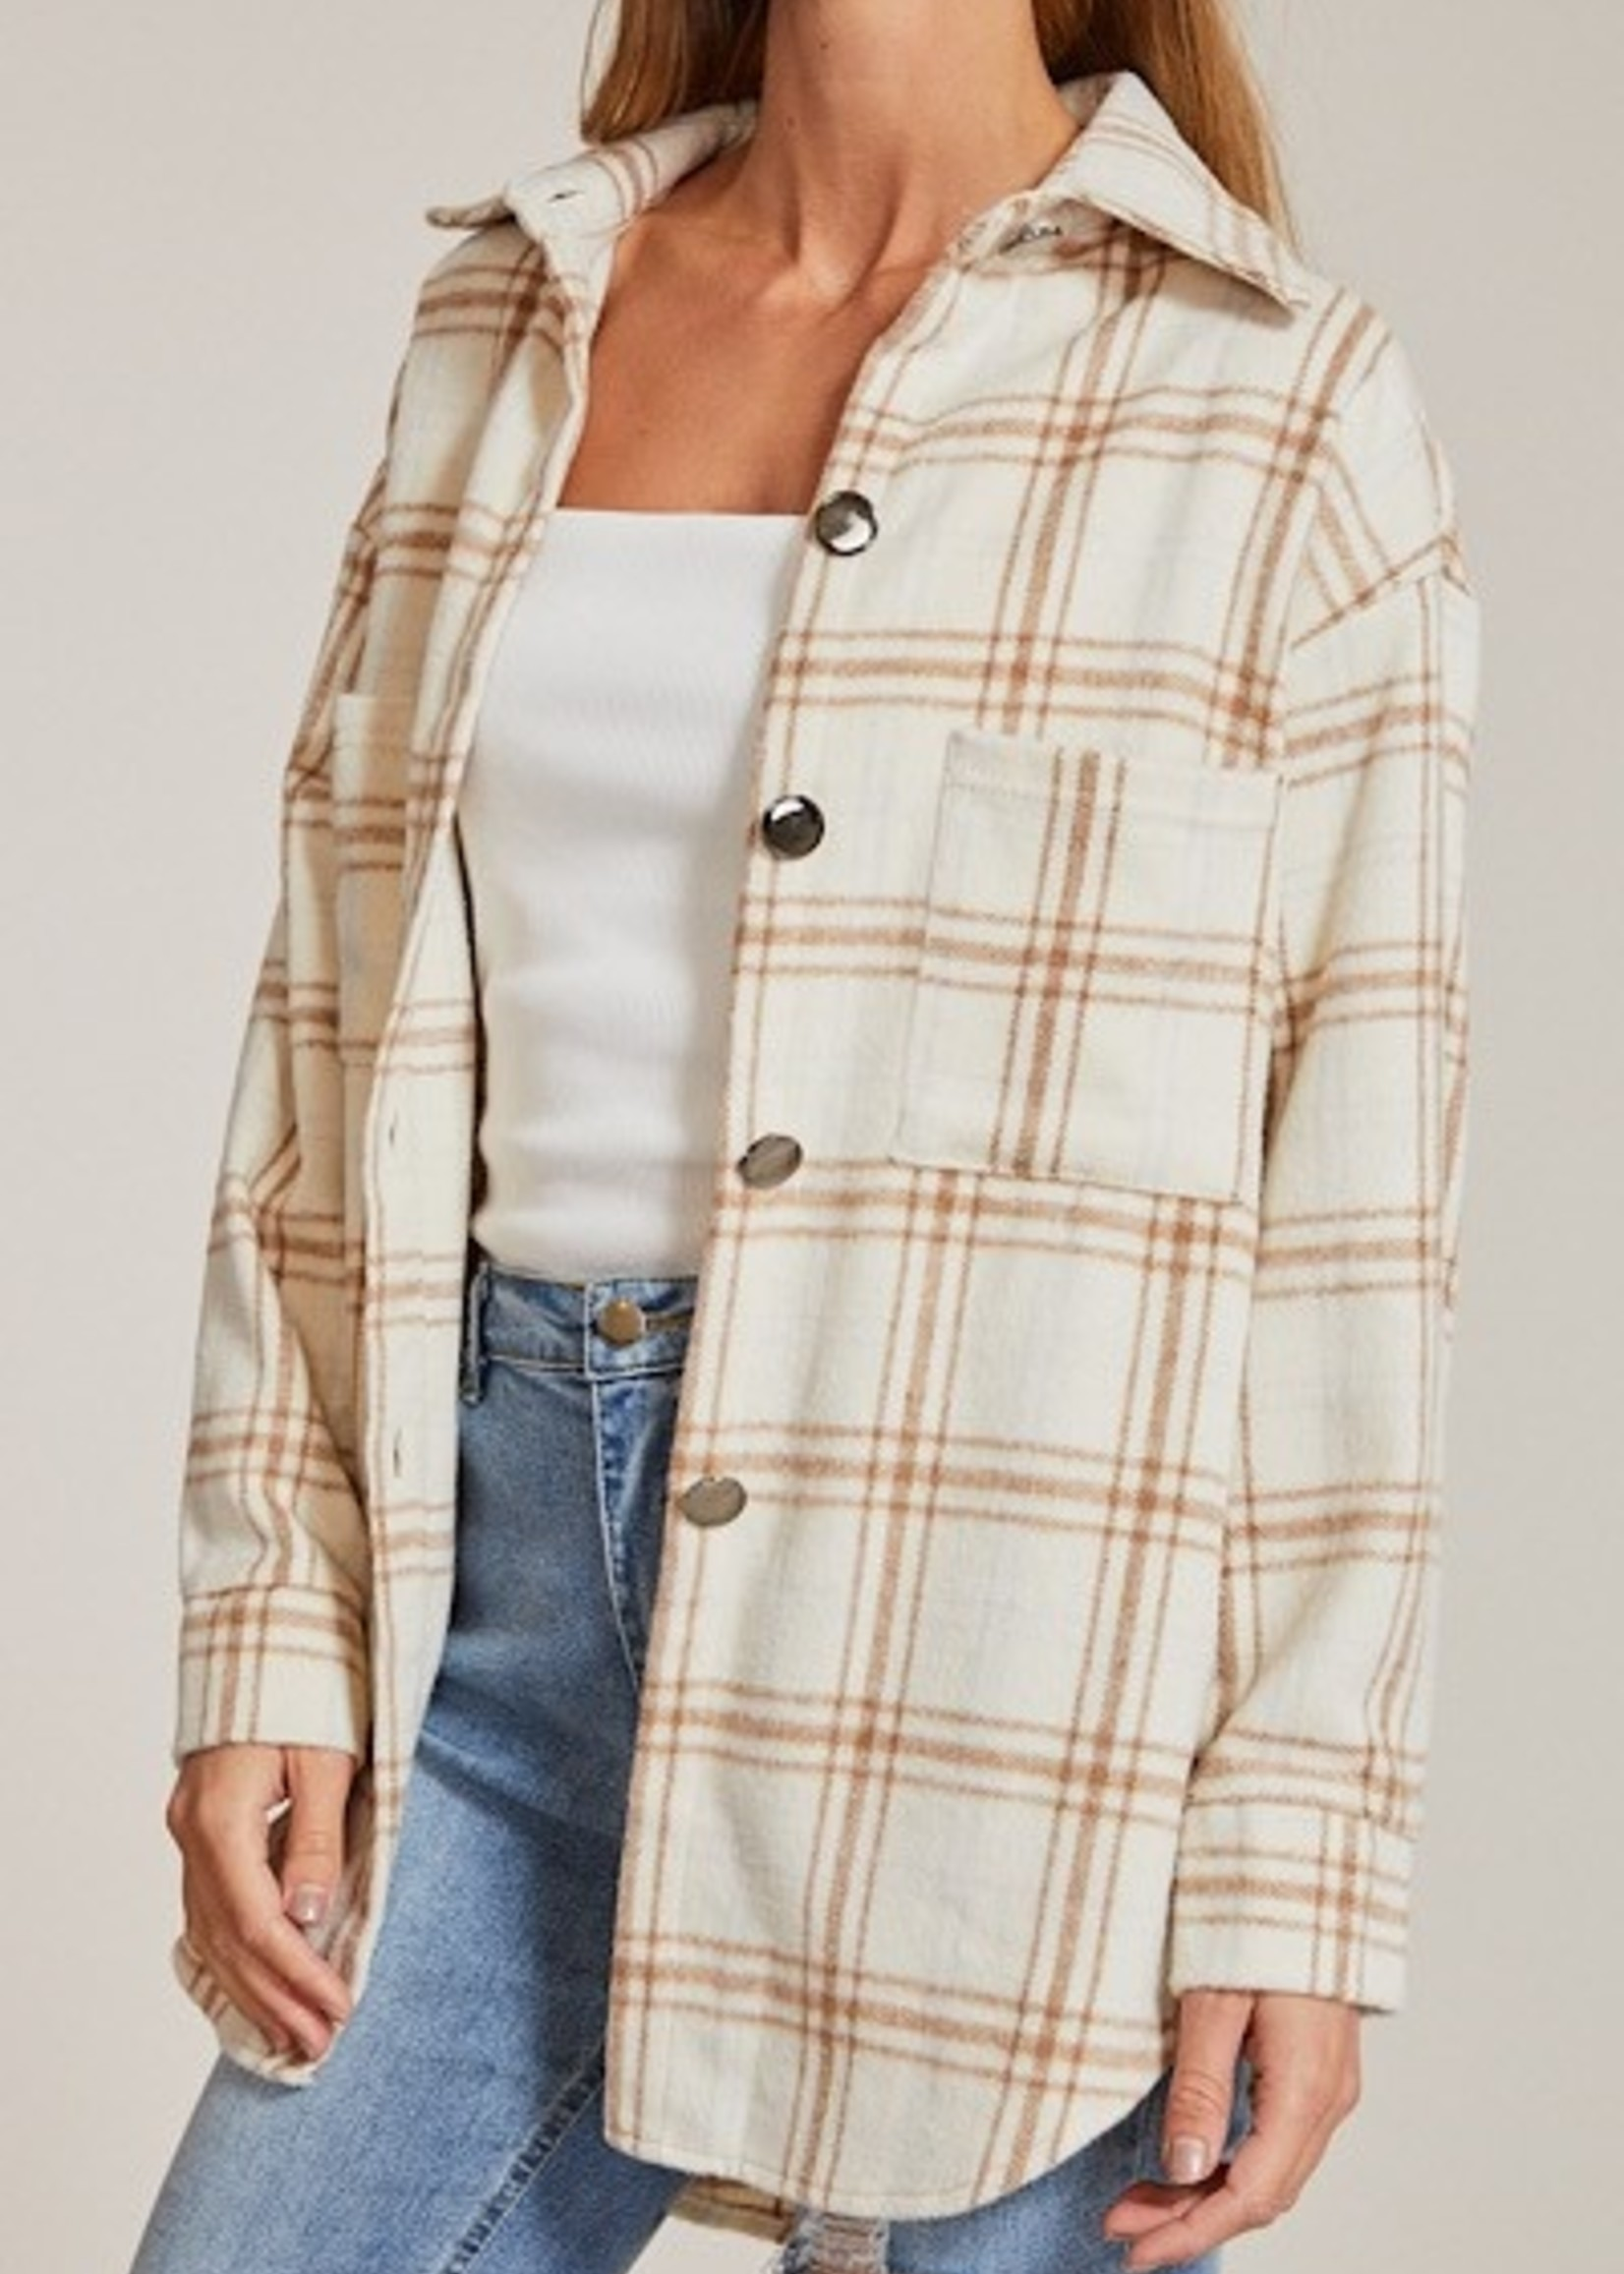 Flannel Jacket - Ivory